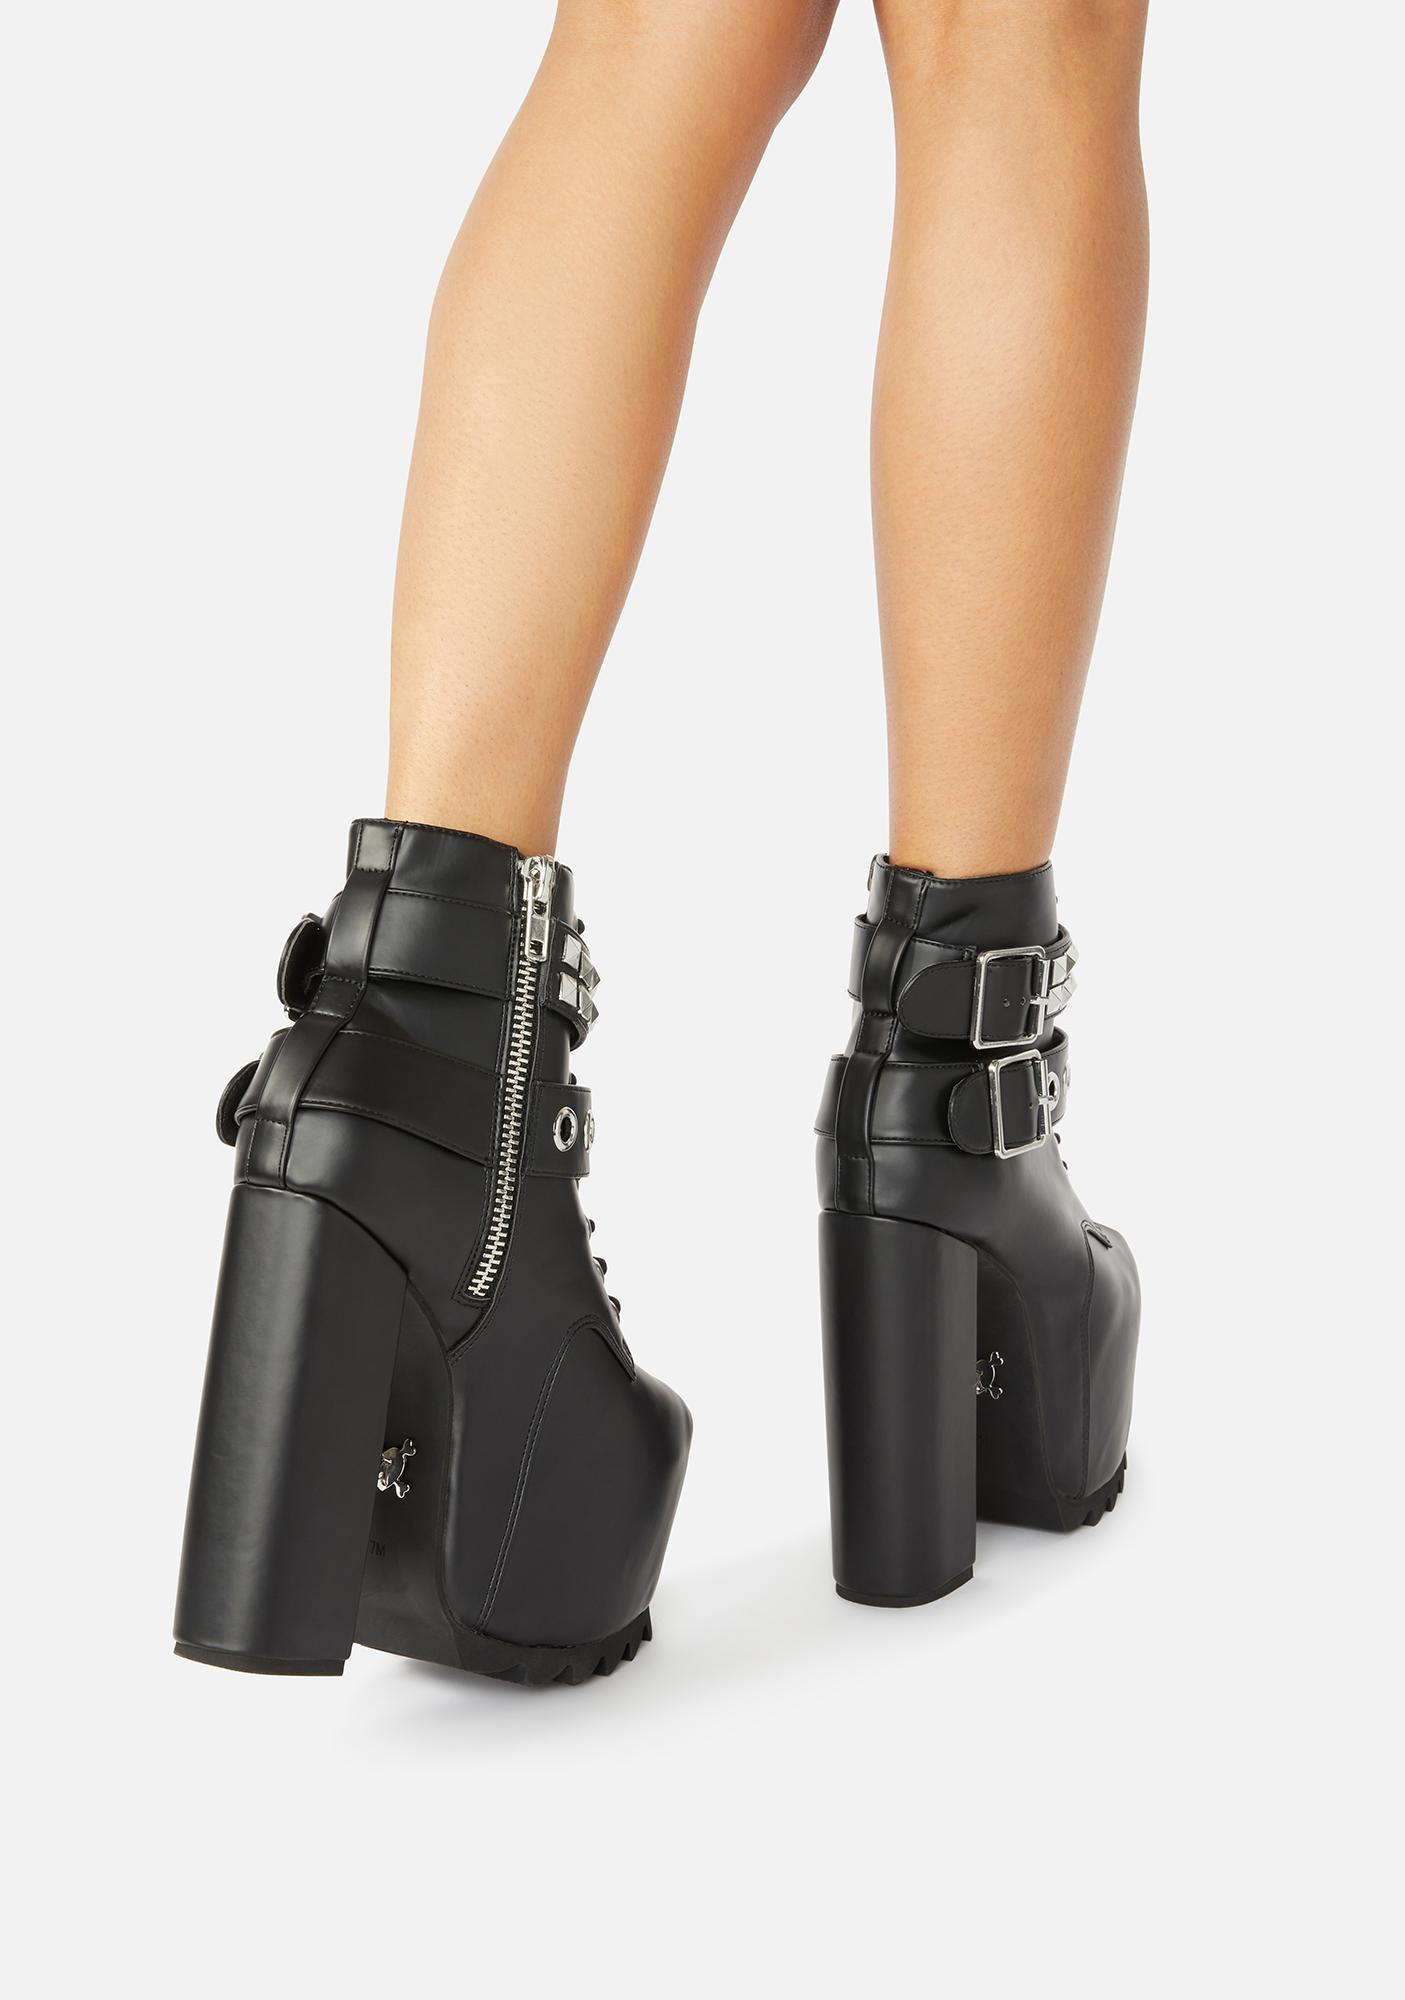 Charla Tedrick Nolita Platform Boots